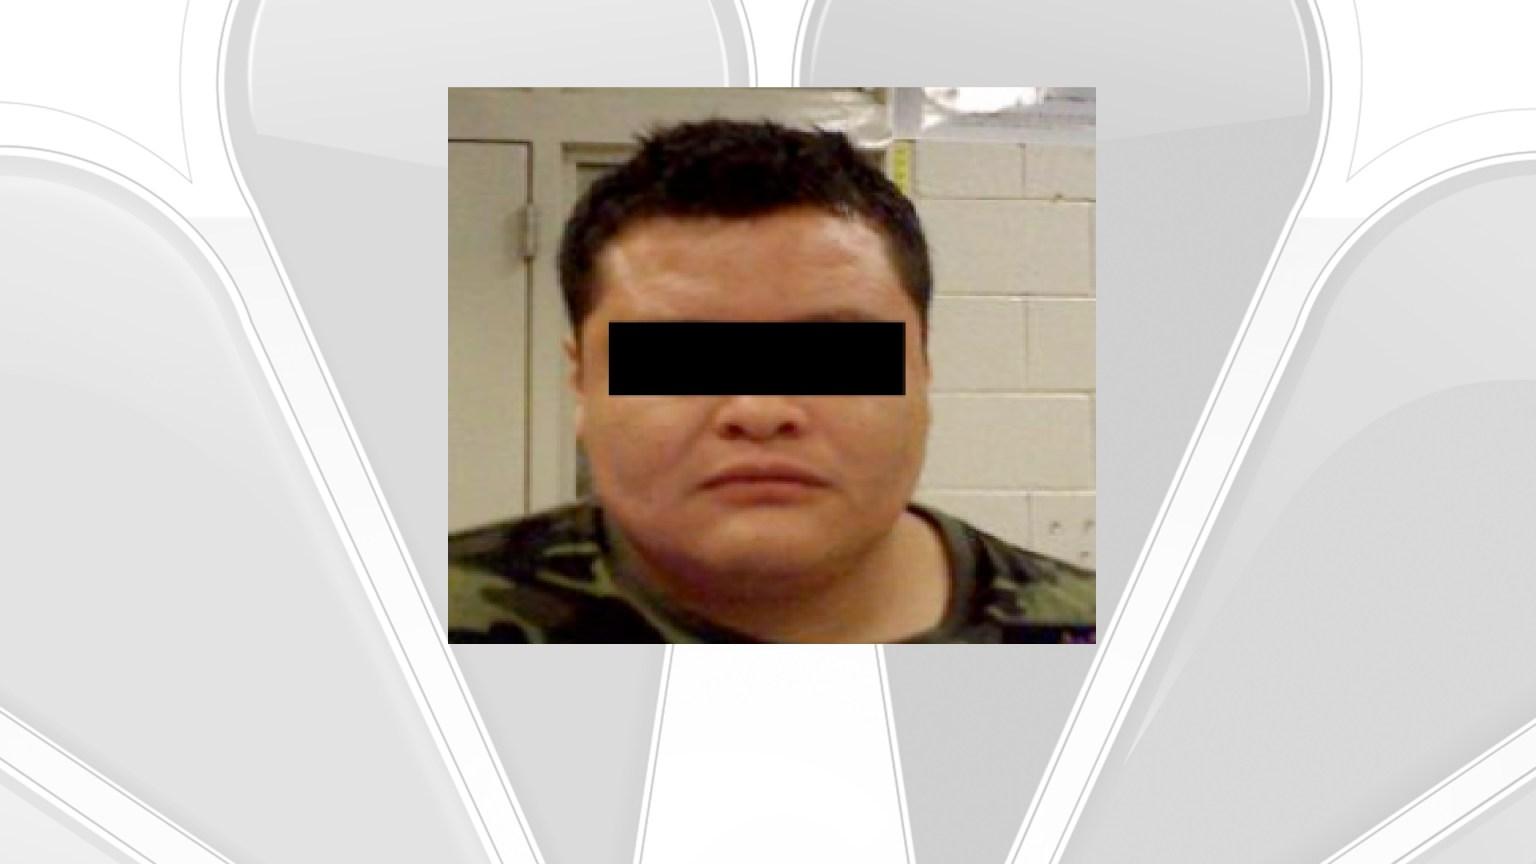 Border Patrol Apprehends Convicted Sex Offender